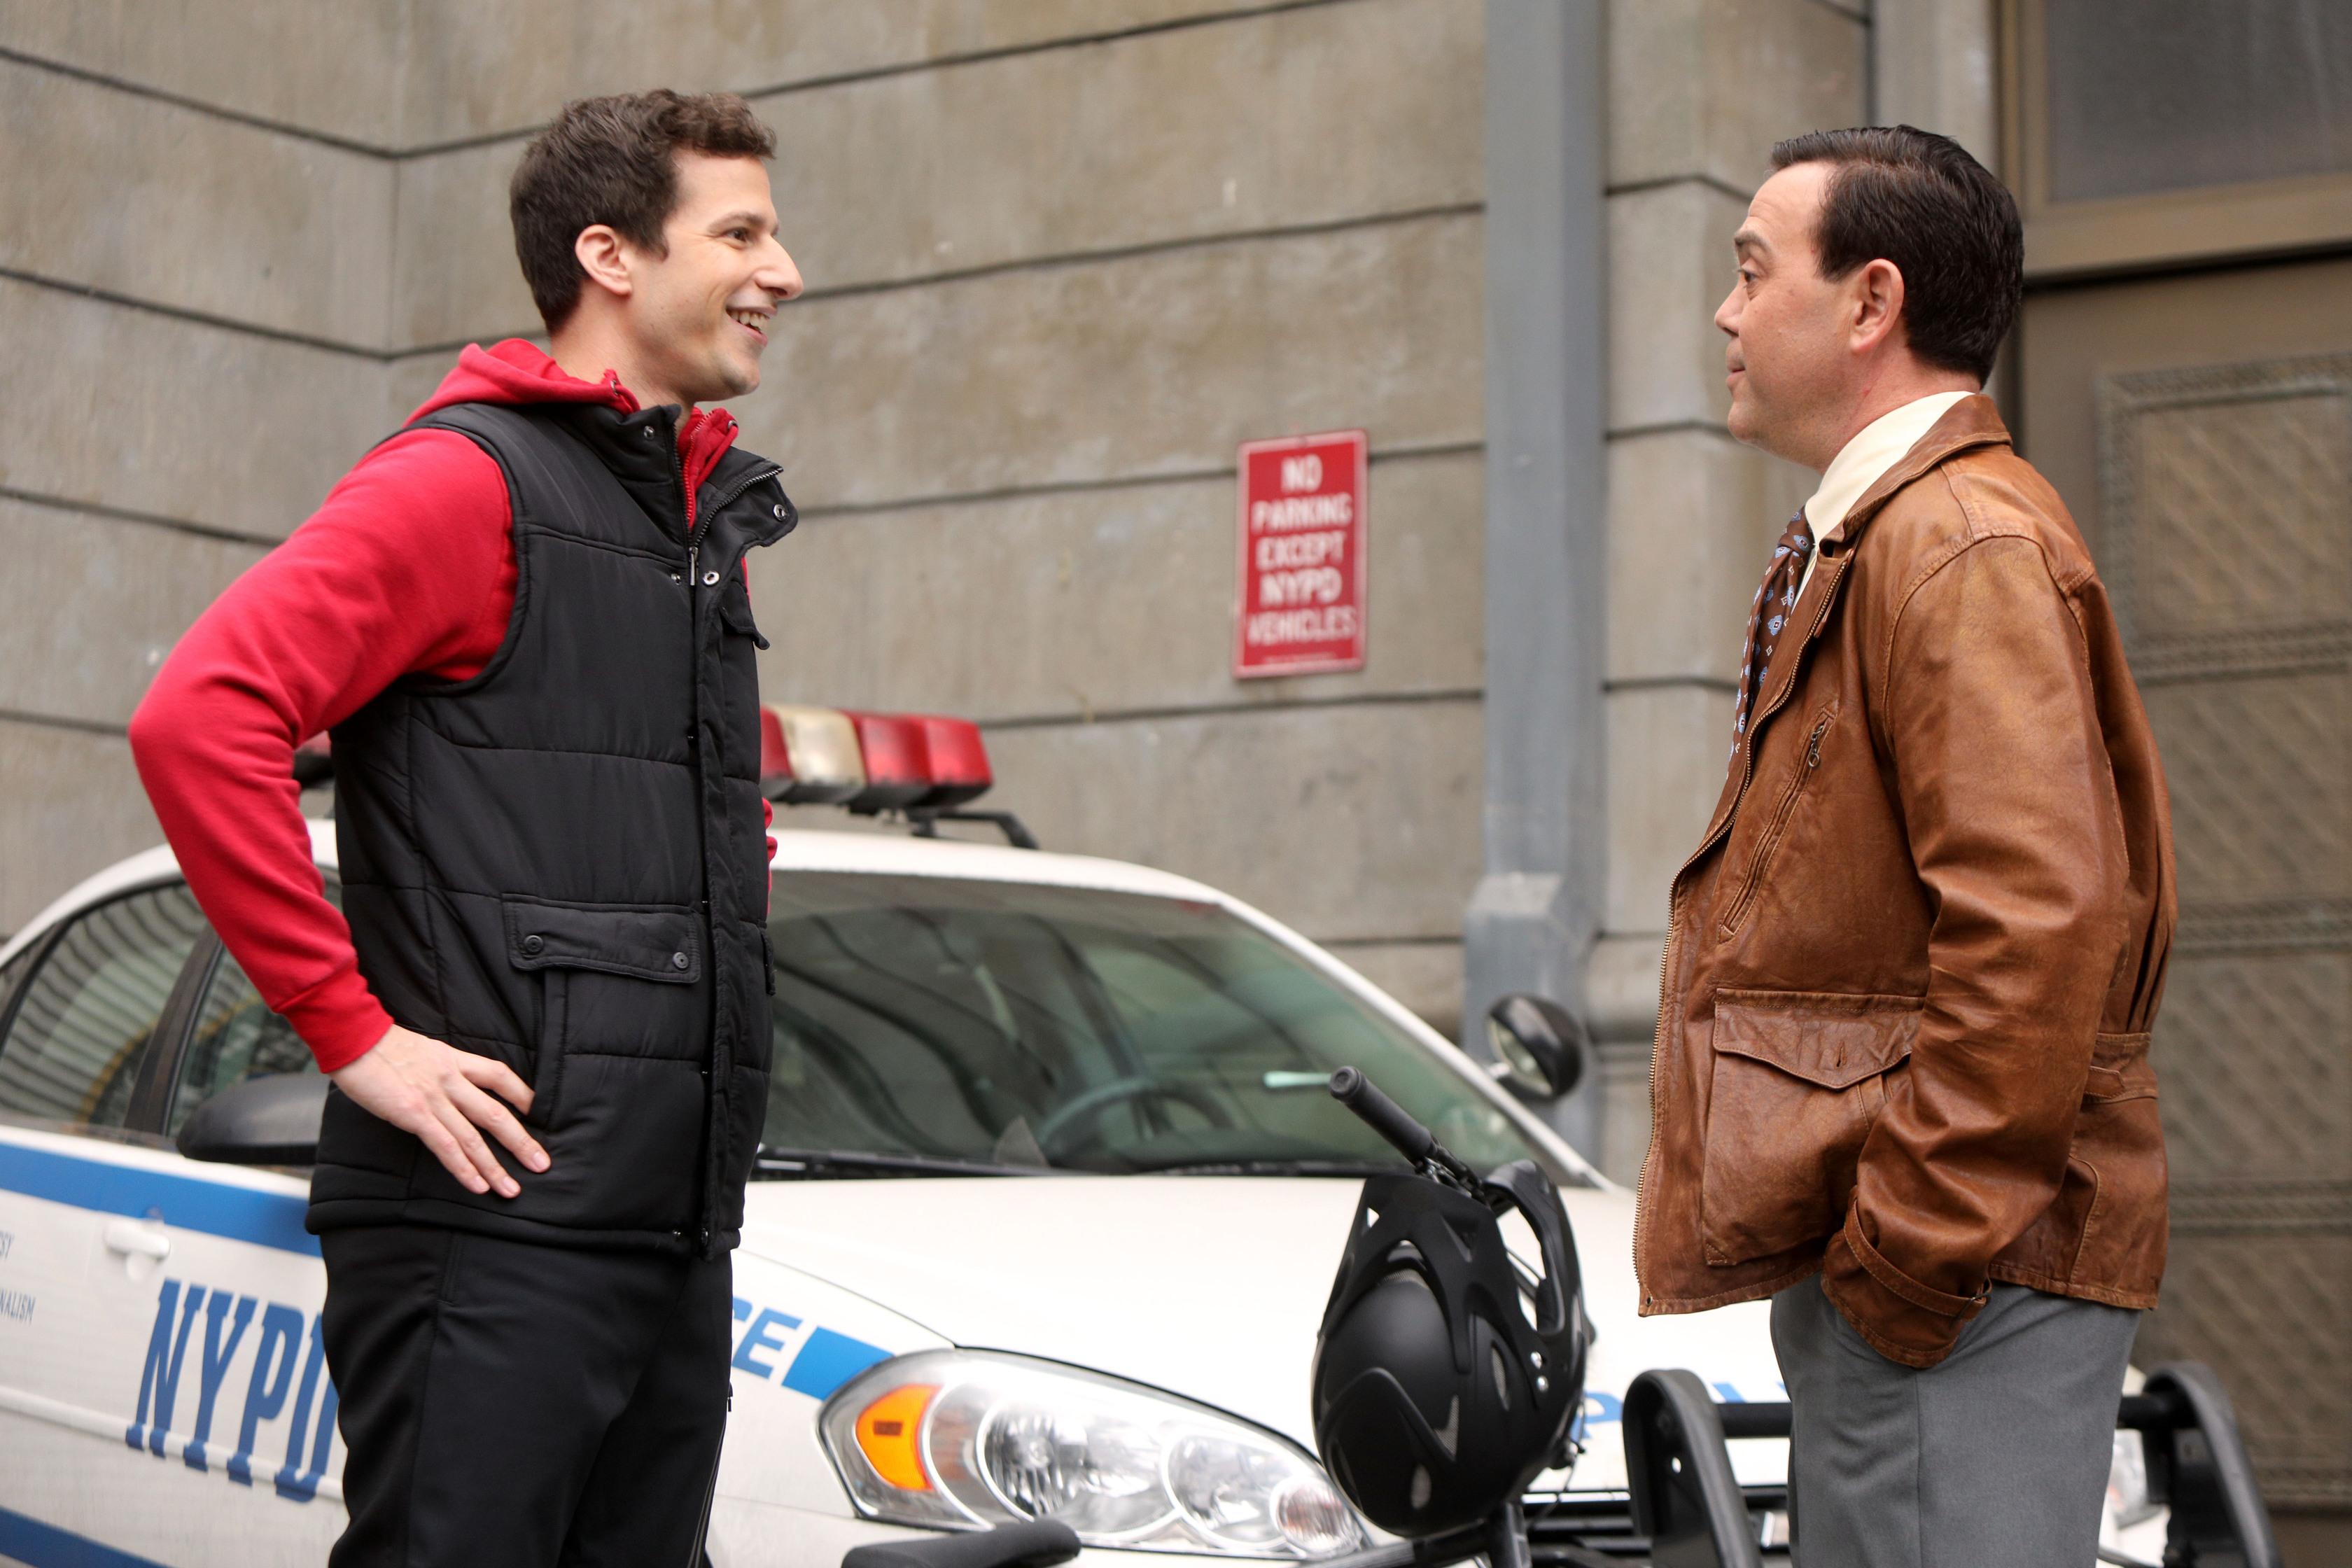 Brooklyn Nine-Nine: The Last Ride | Season 4 | Episode 15